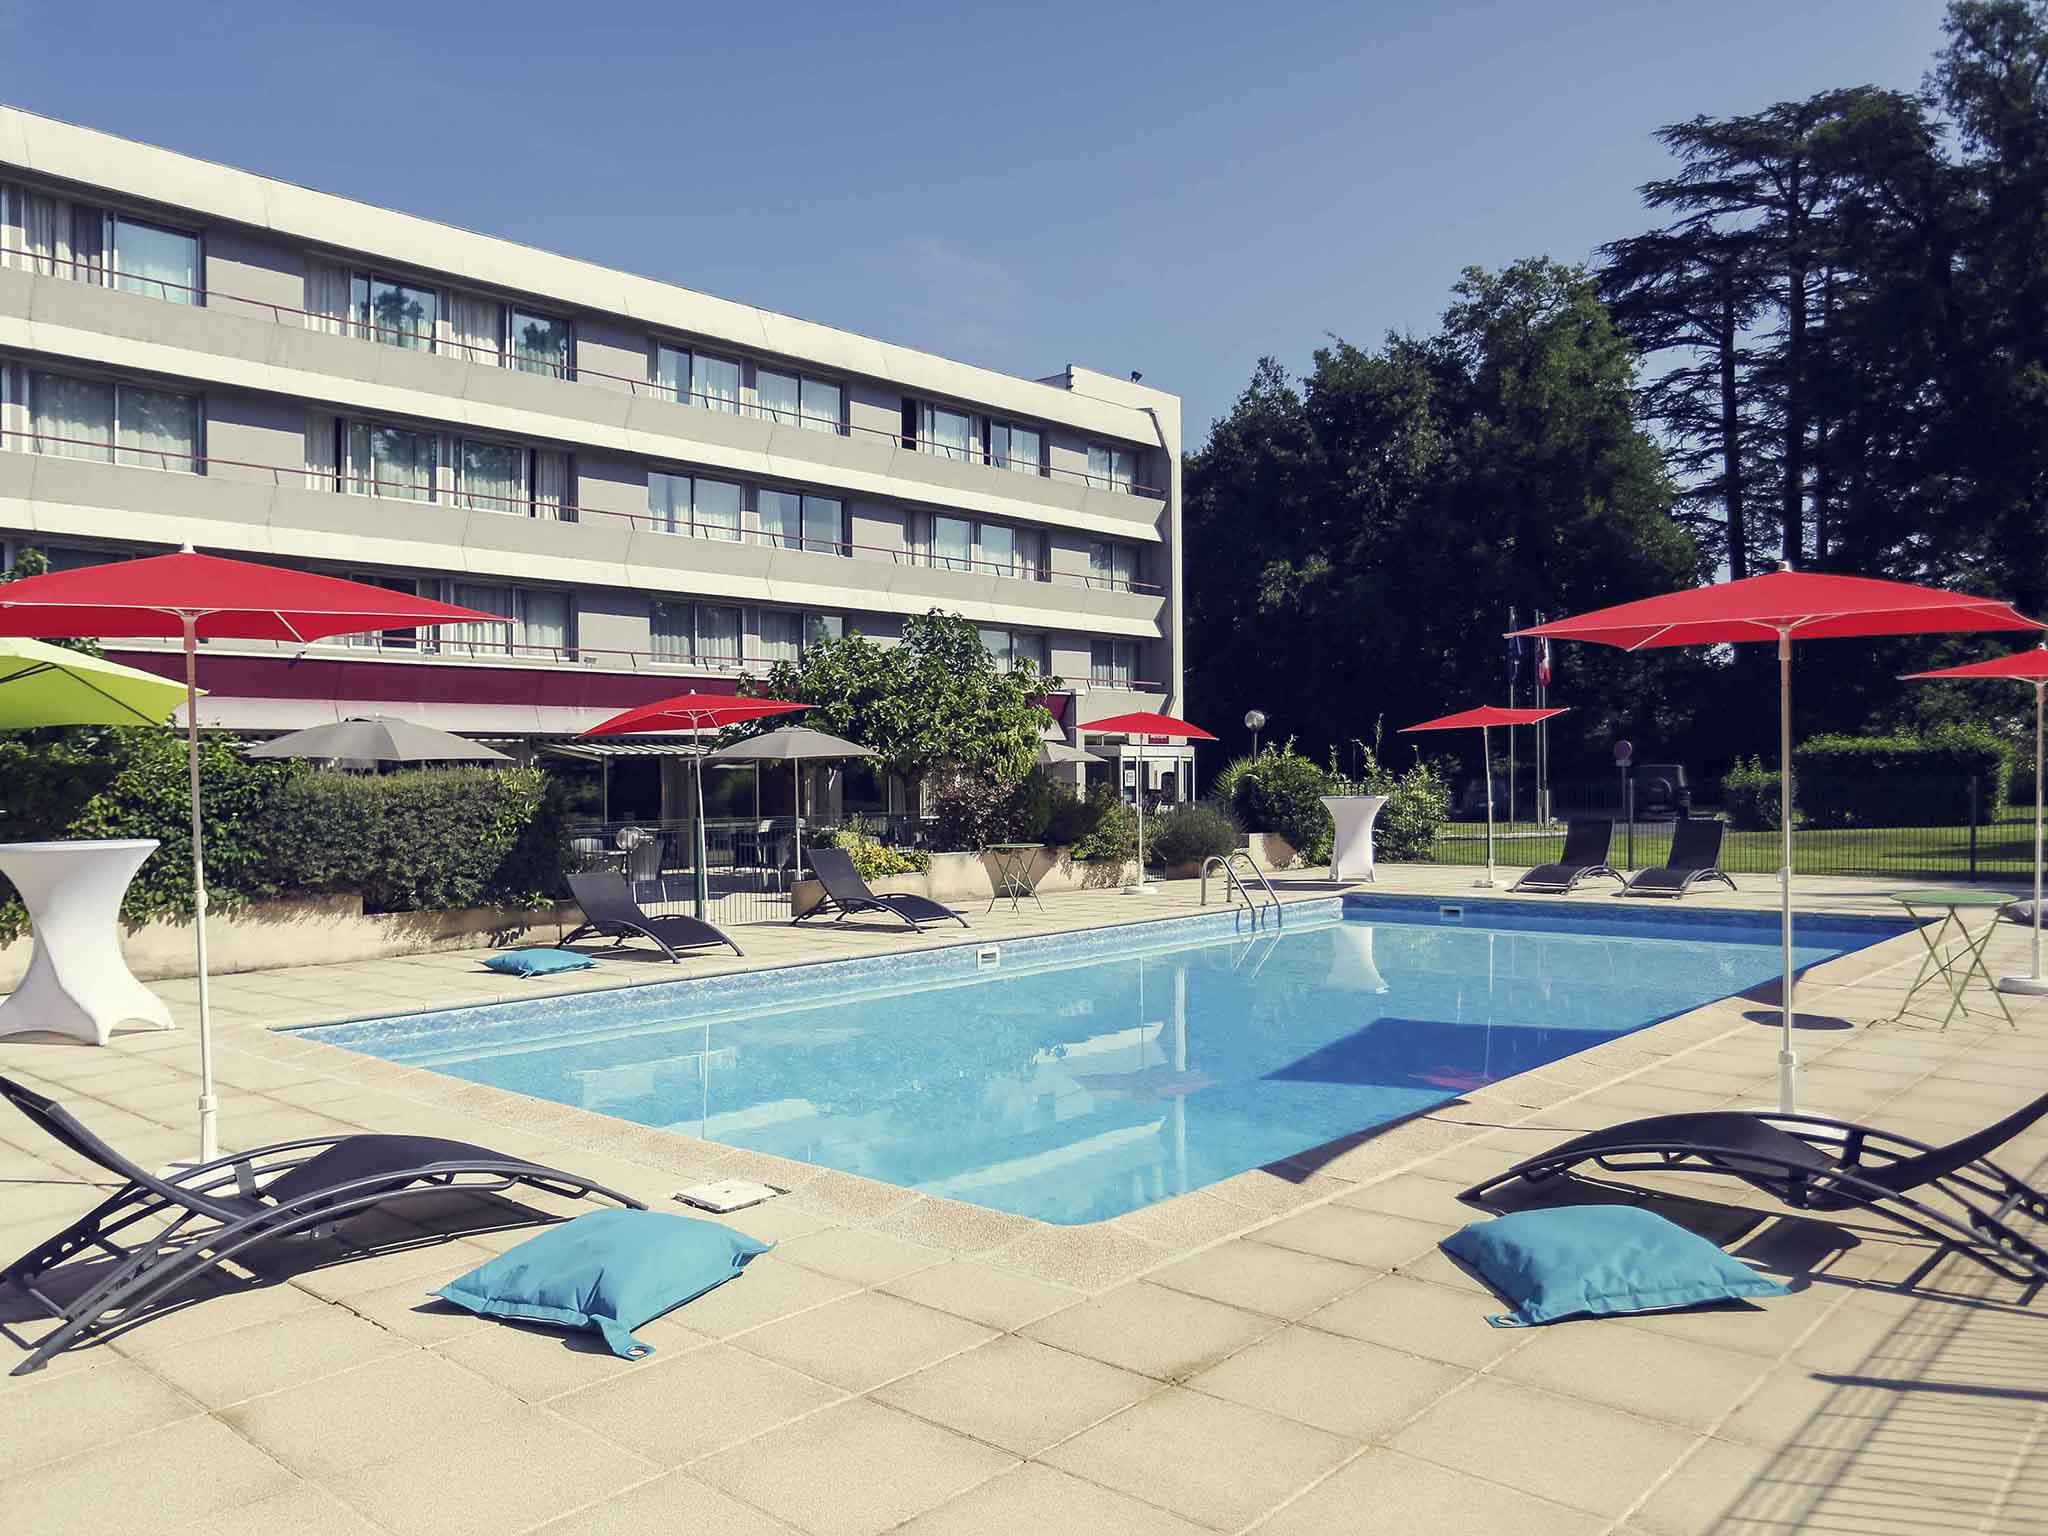 فندق - Hôtel Mercure Brive